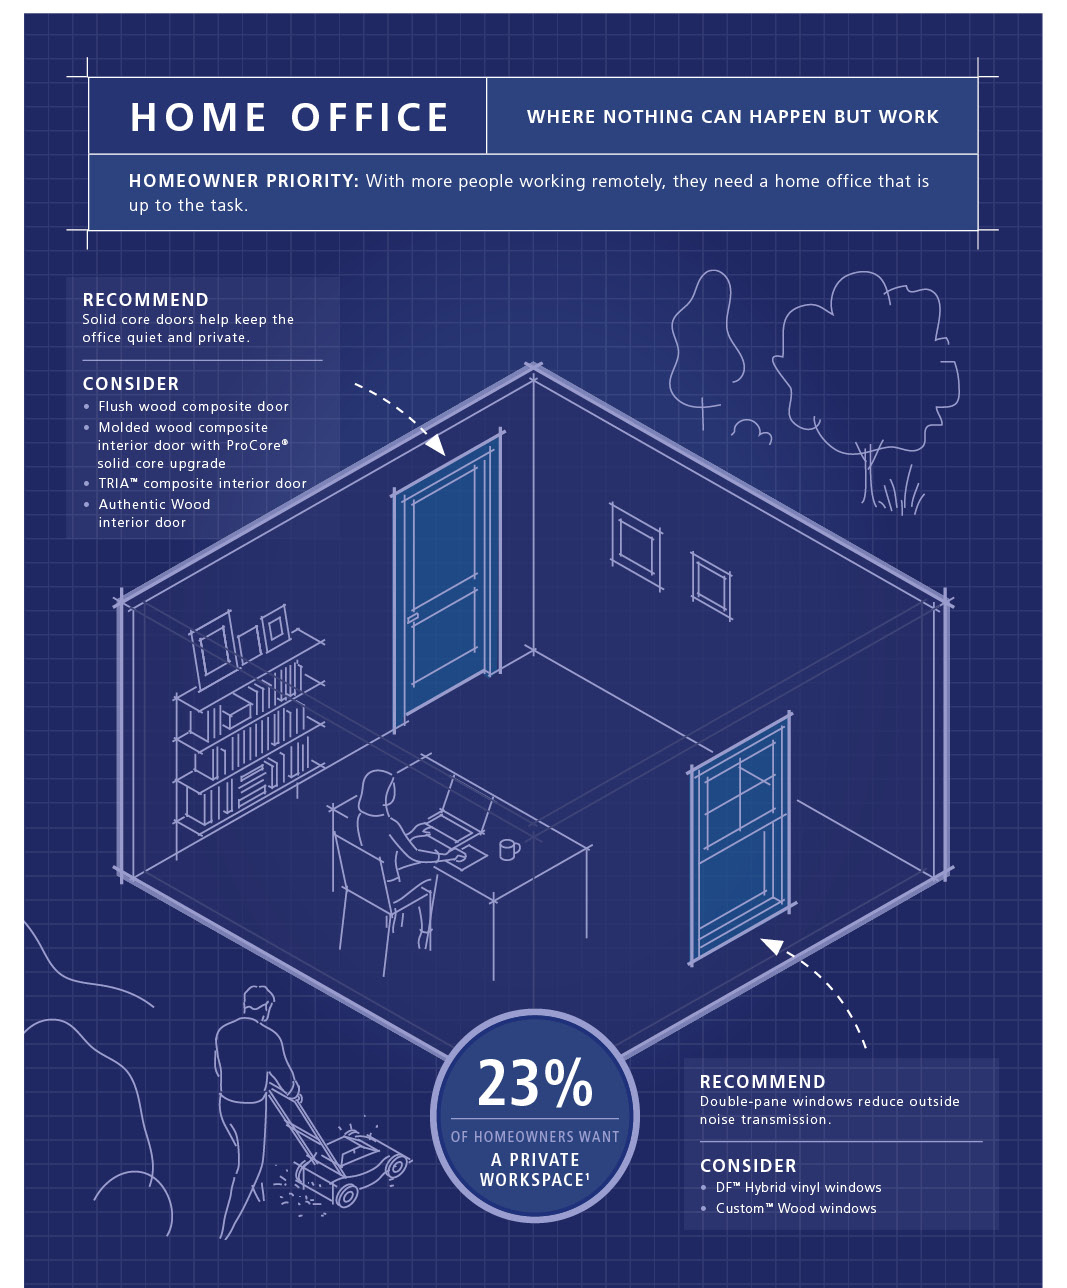 homeoffice_remodeling